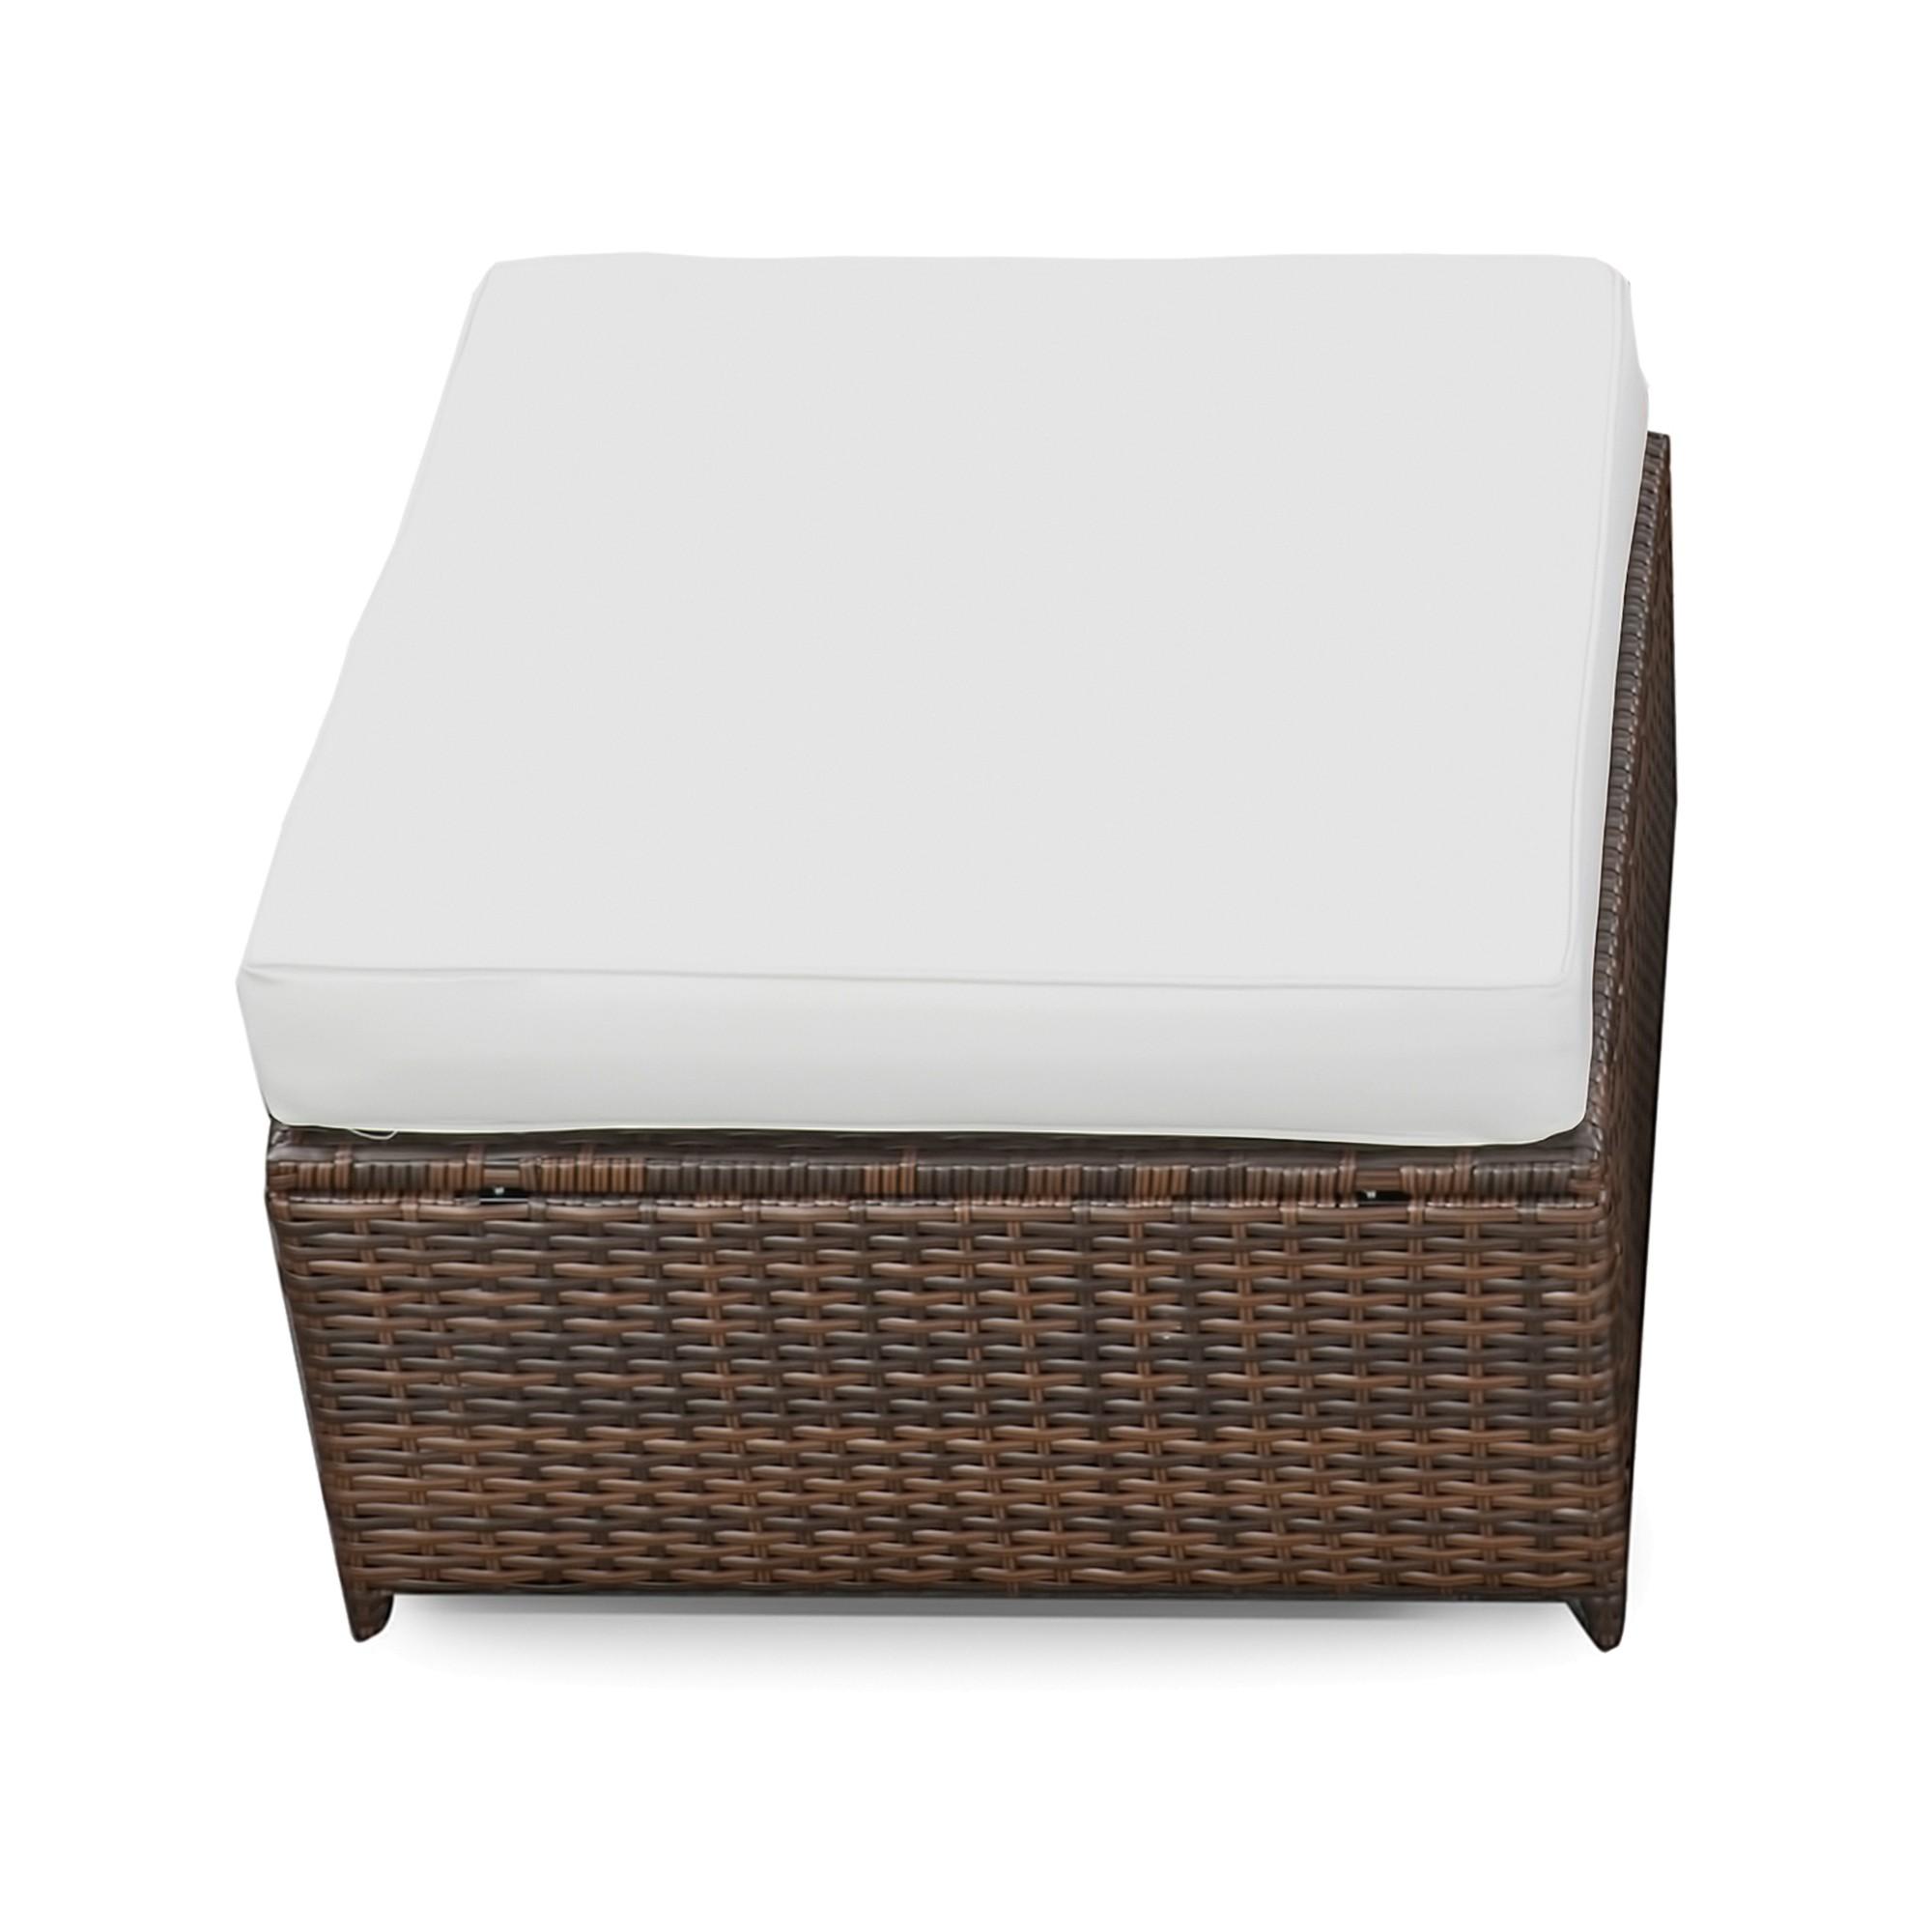 lounge gartenm bel hocker g nstig lounge hocker gartenm bel kaufen. Black Bedroom Furniture Sets. Home Design Ideas